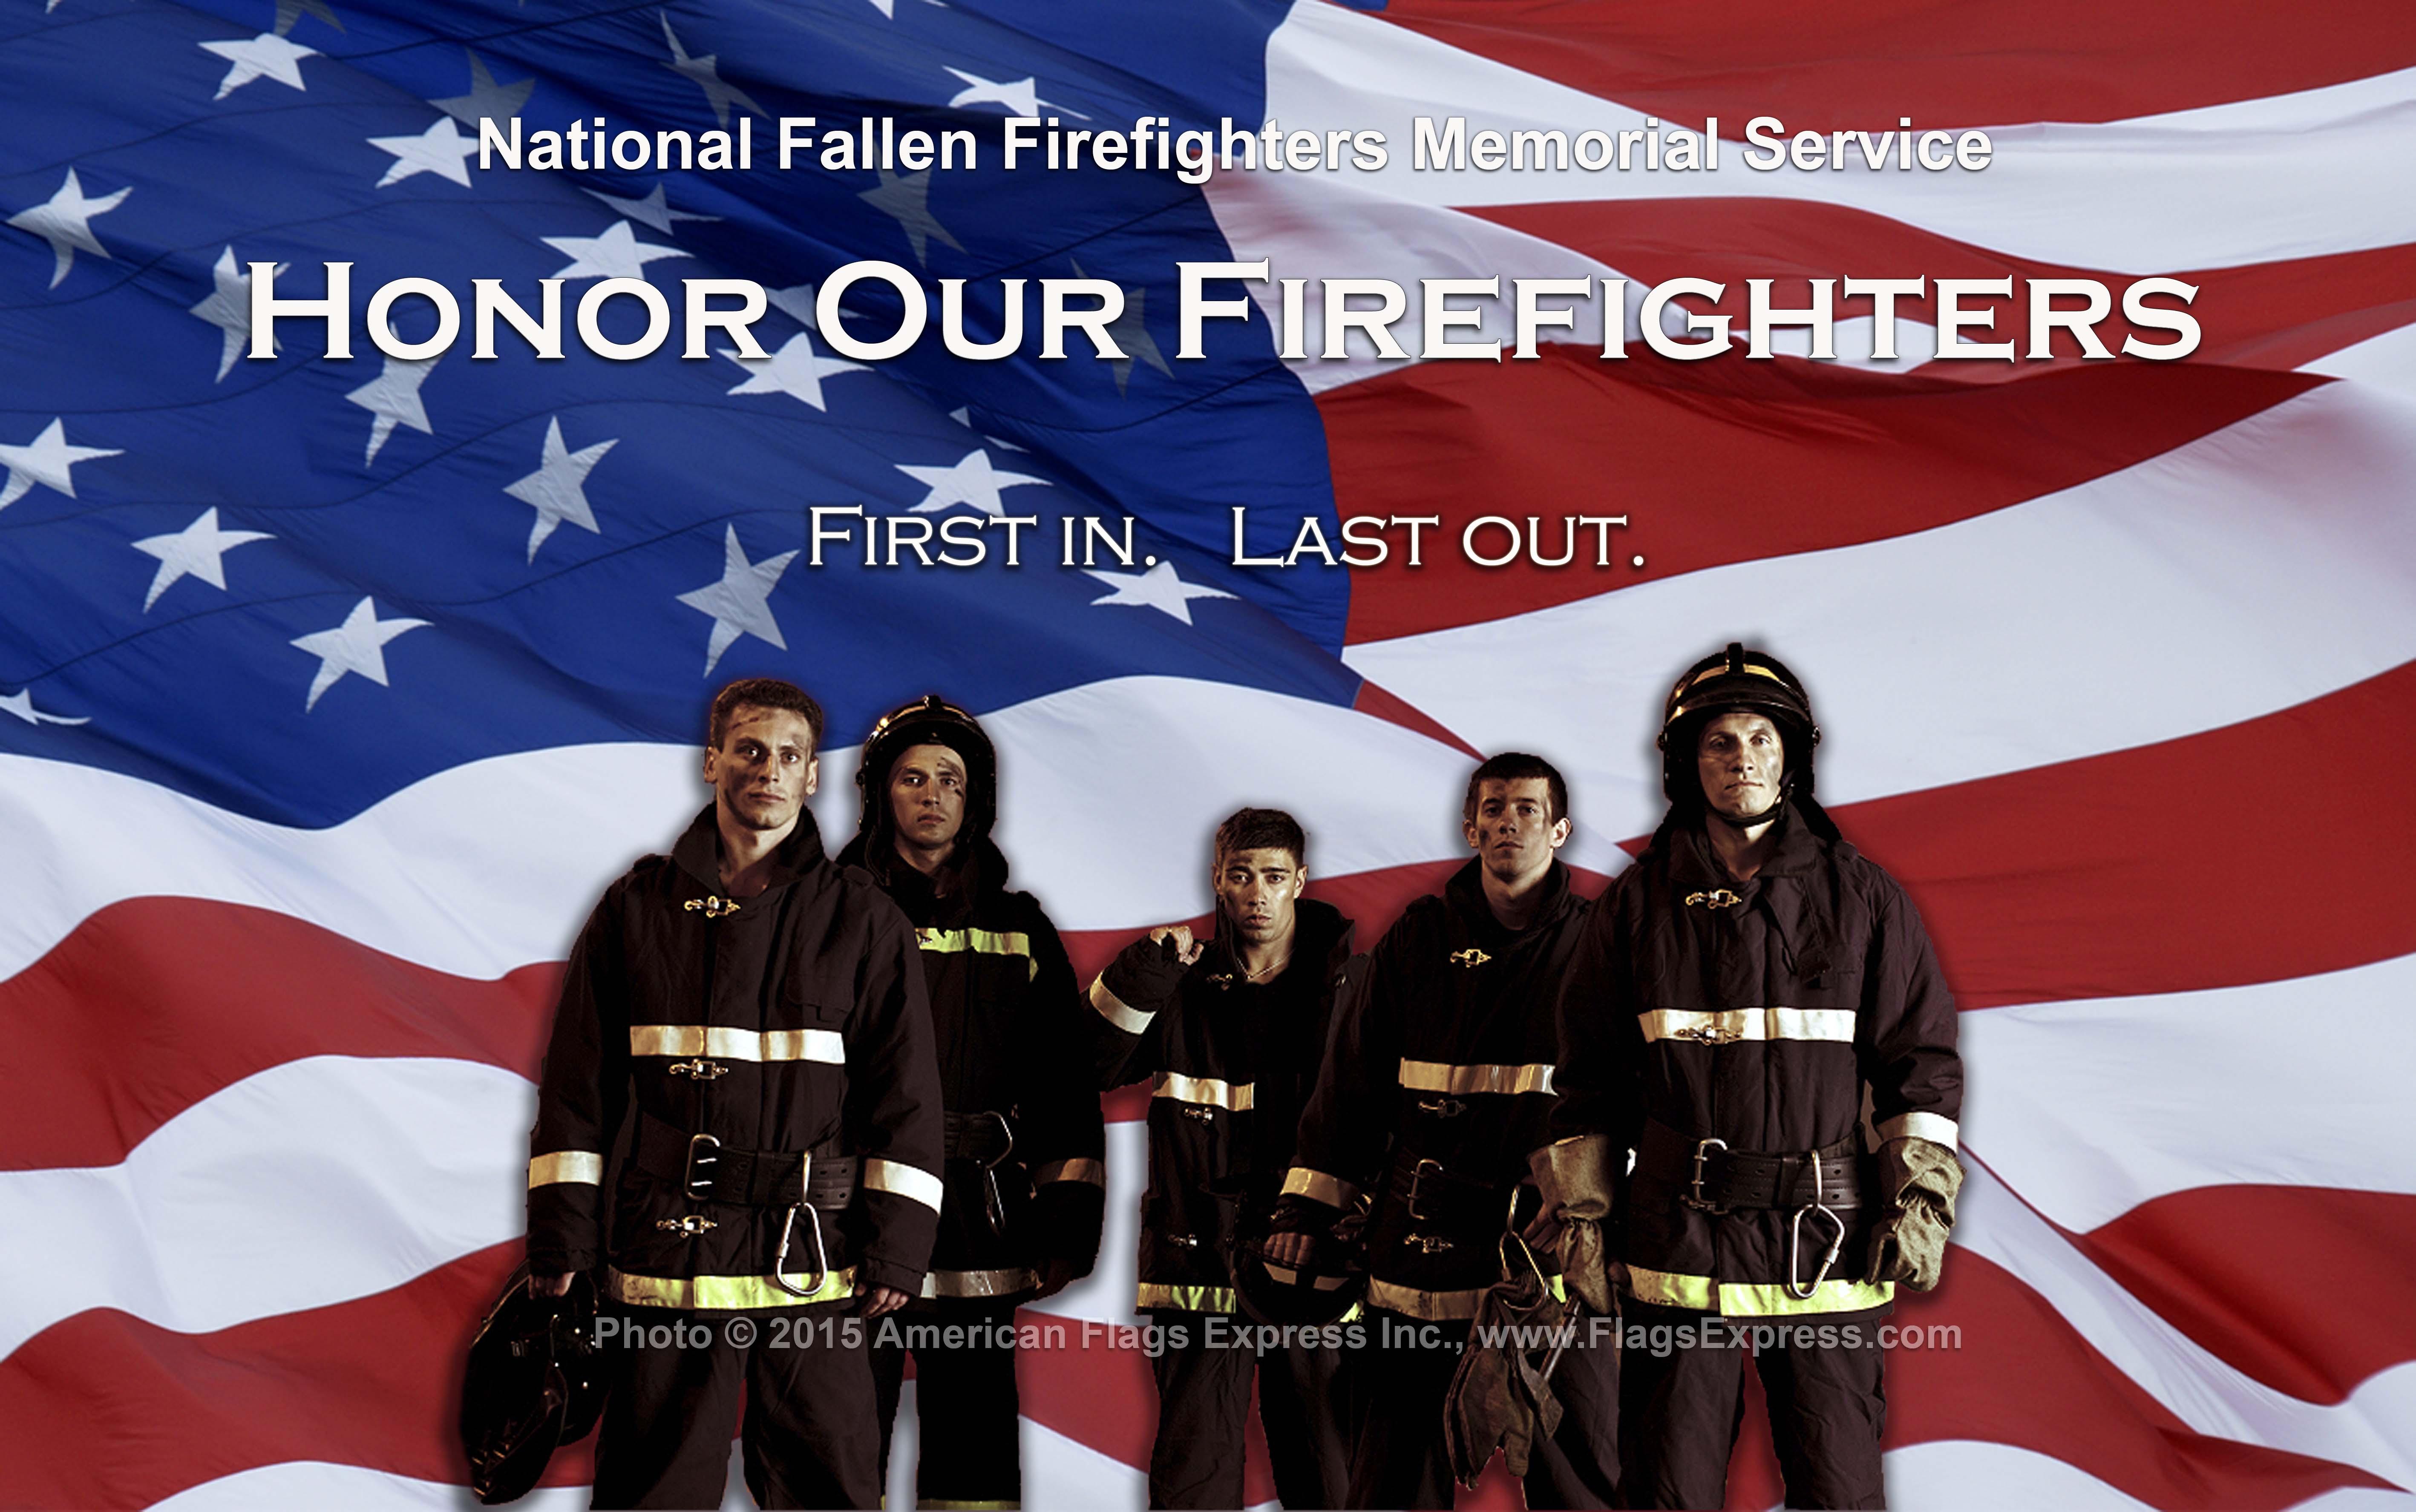 Firefighter Memorial Day 2016 Clipart.